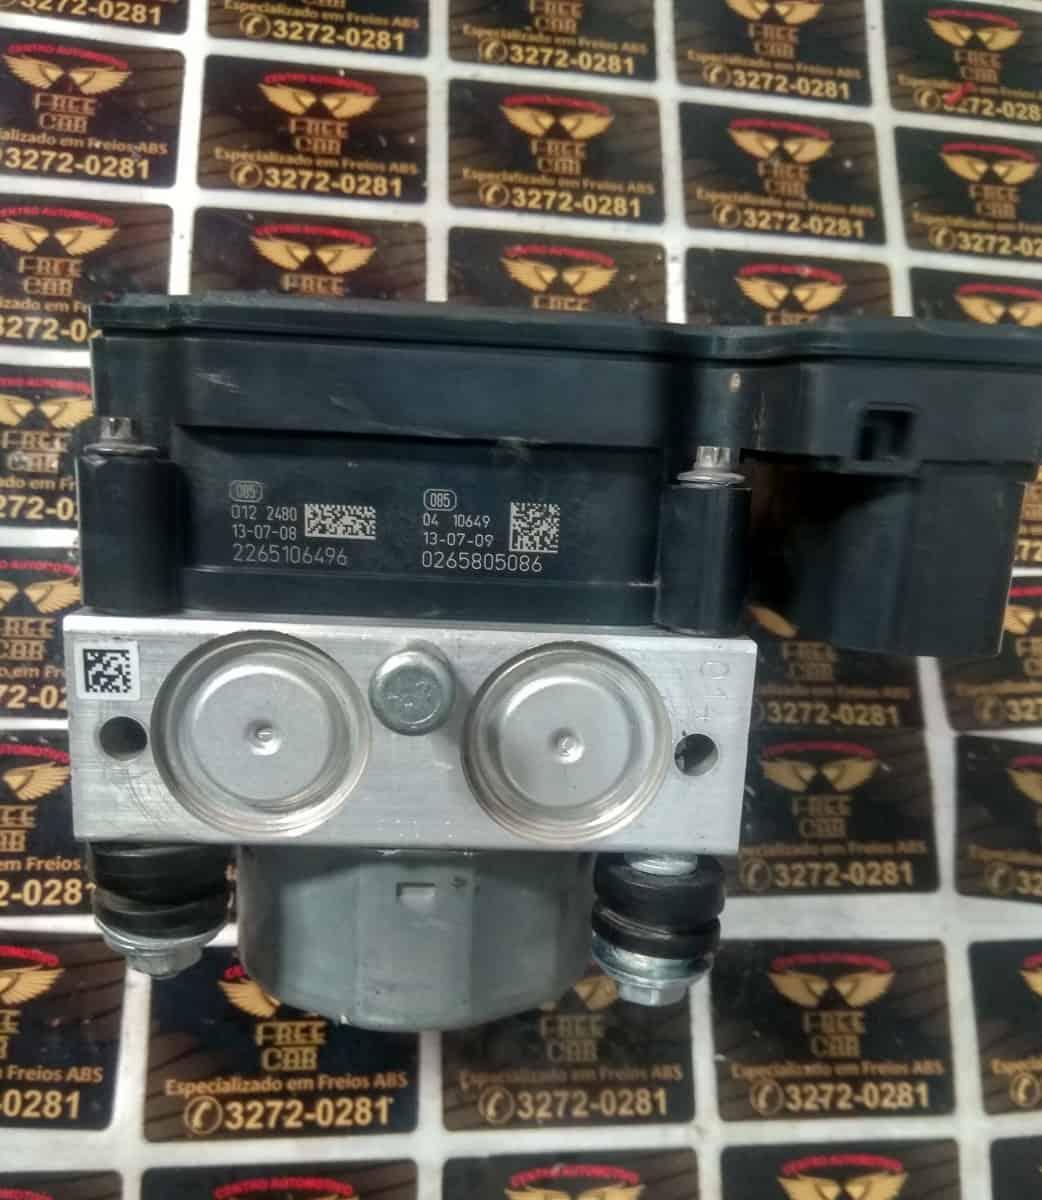 Modulo ABS Fiat 0 265 260 288 / 51918289 - Foto 3